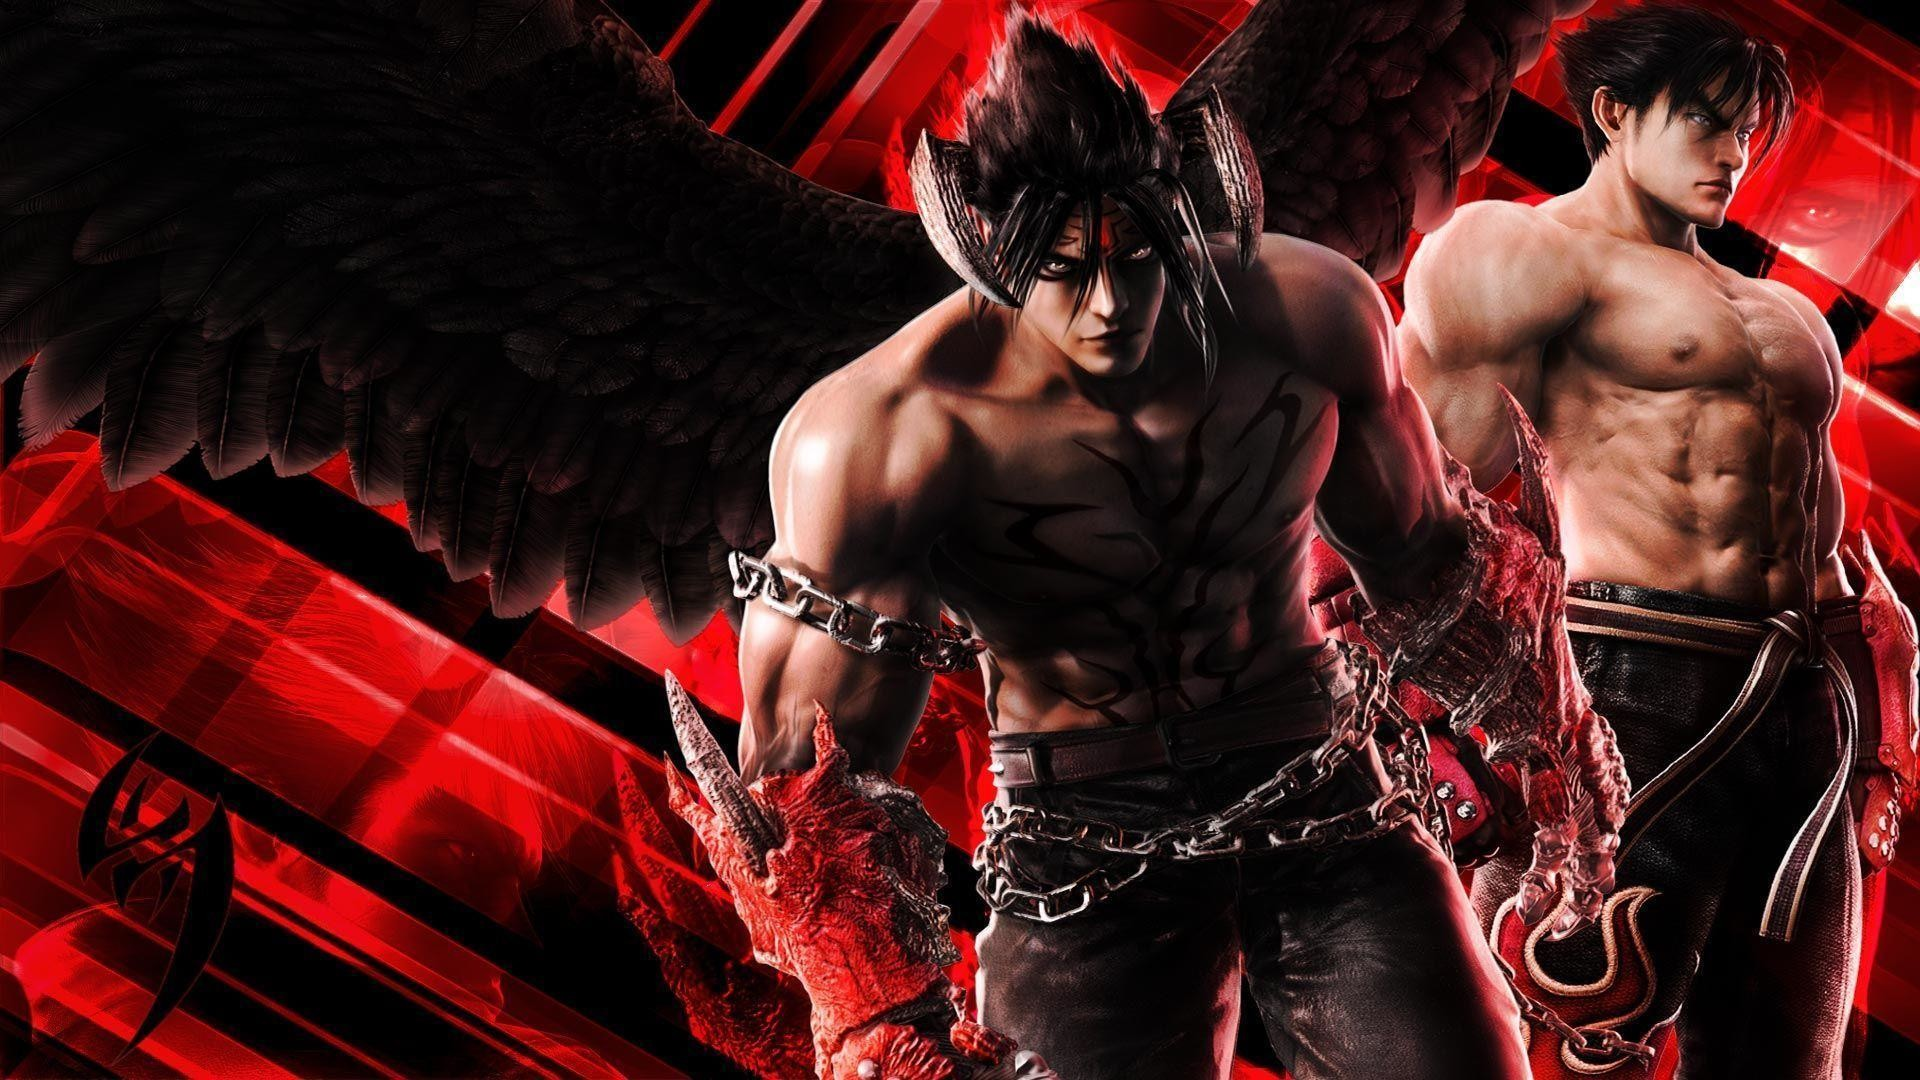 Jin Kazama Wallpaper Tekken 6 ①